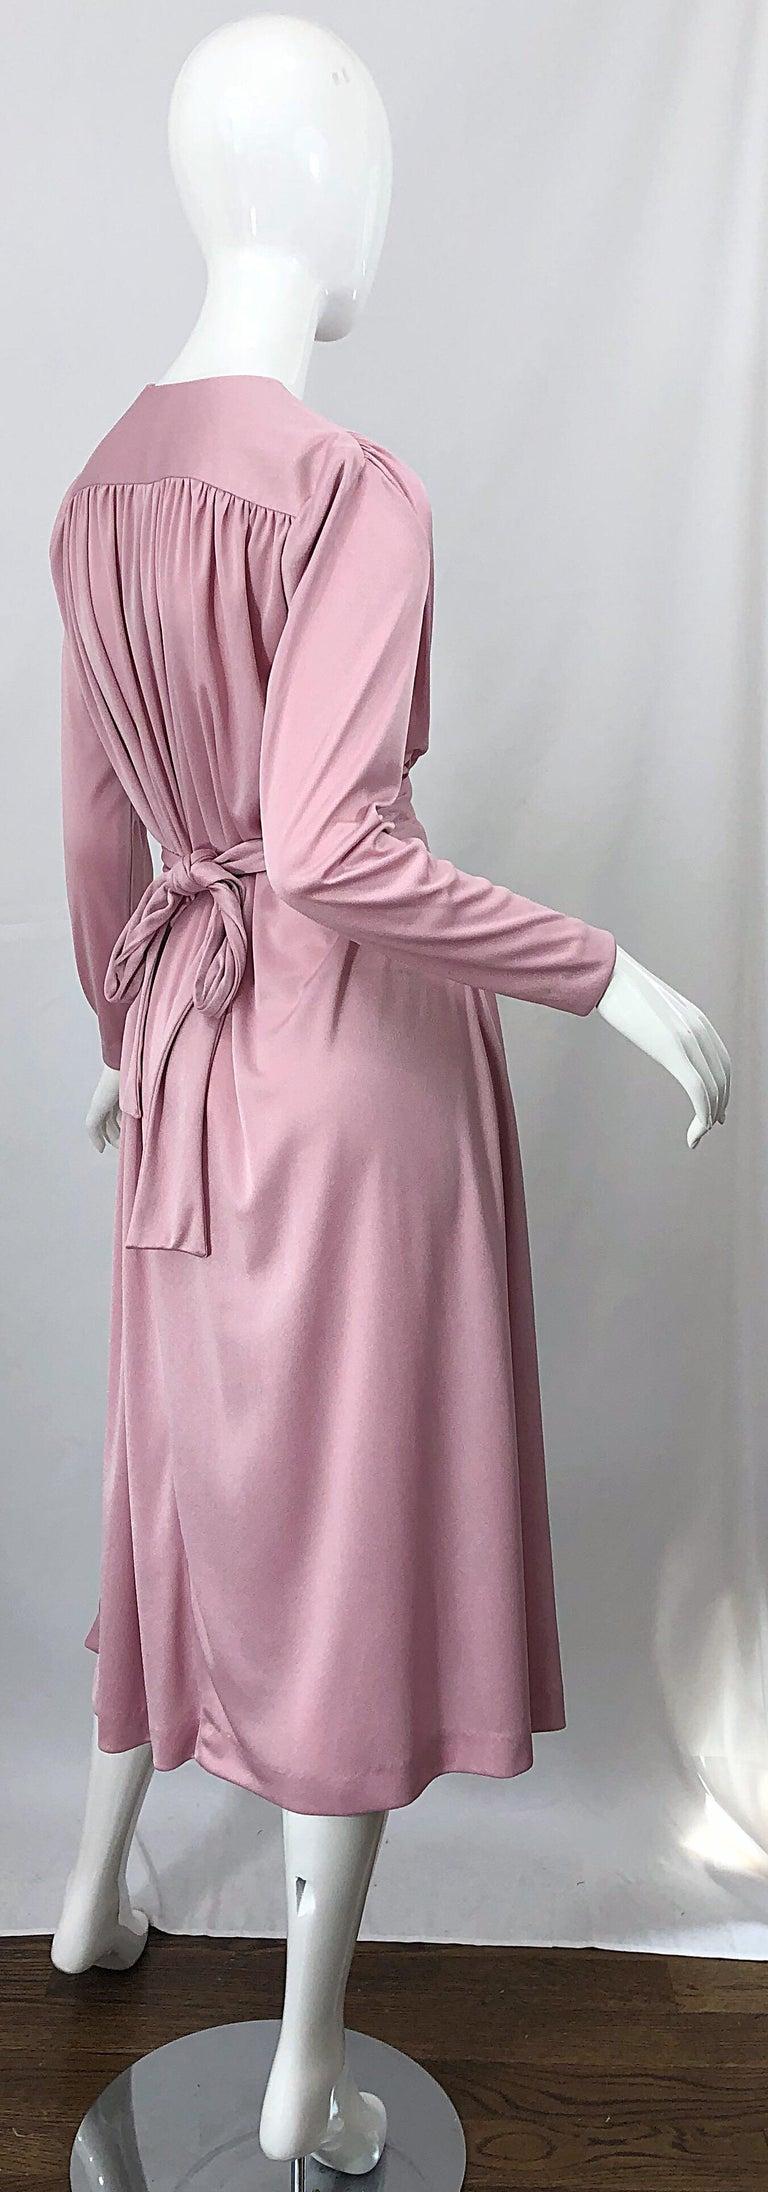 Joy Stevens 1970s Pink Mauve Dusty Rose Long Sleeve Disco Vintage 70s Dress For Sale 3